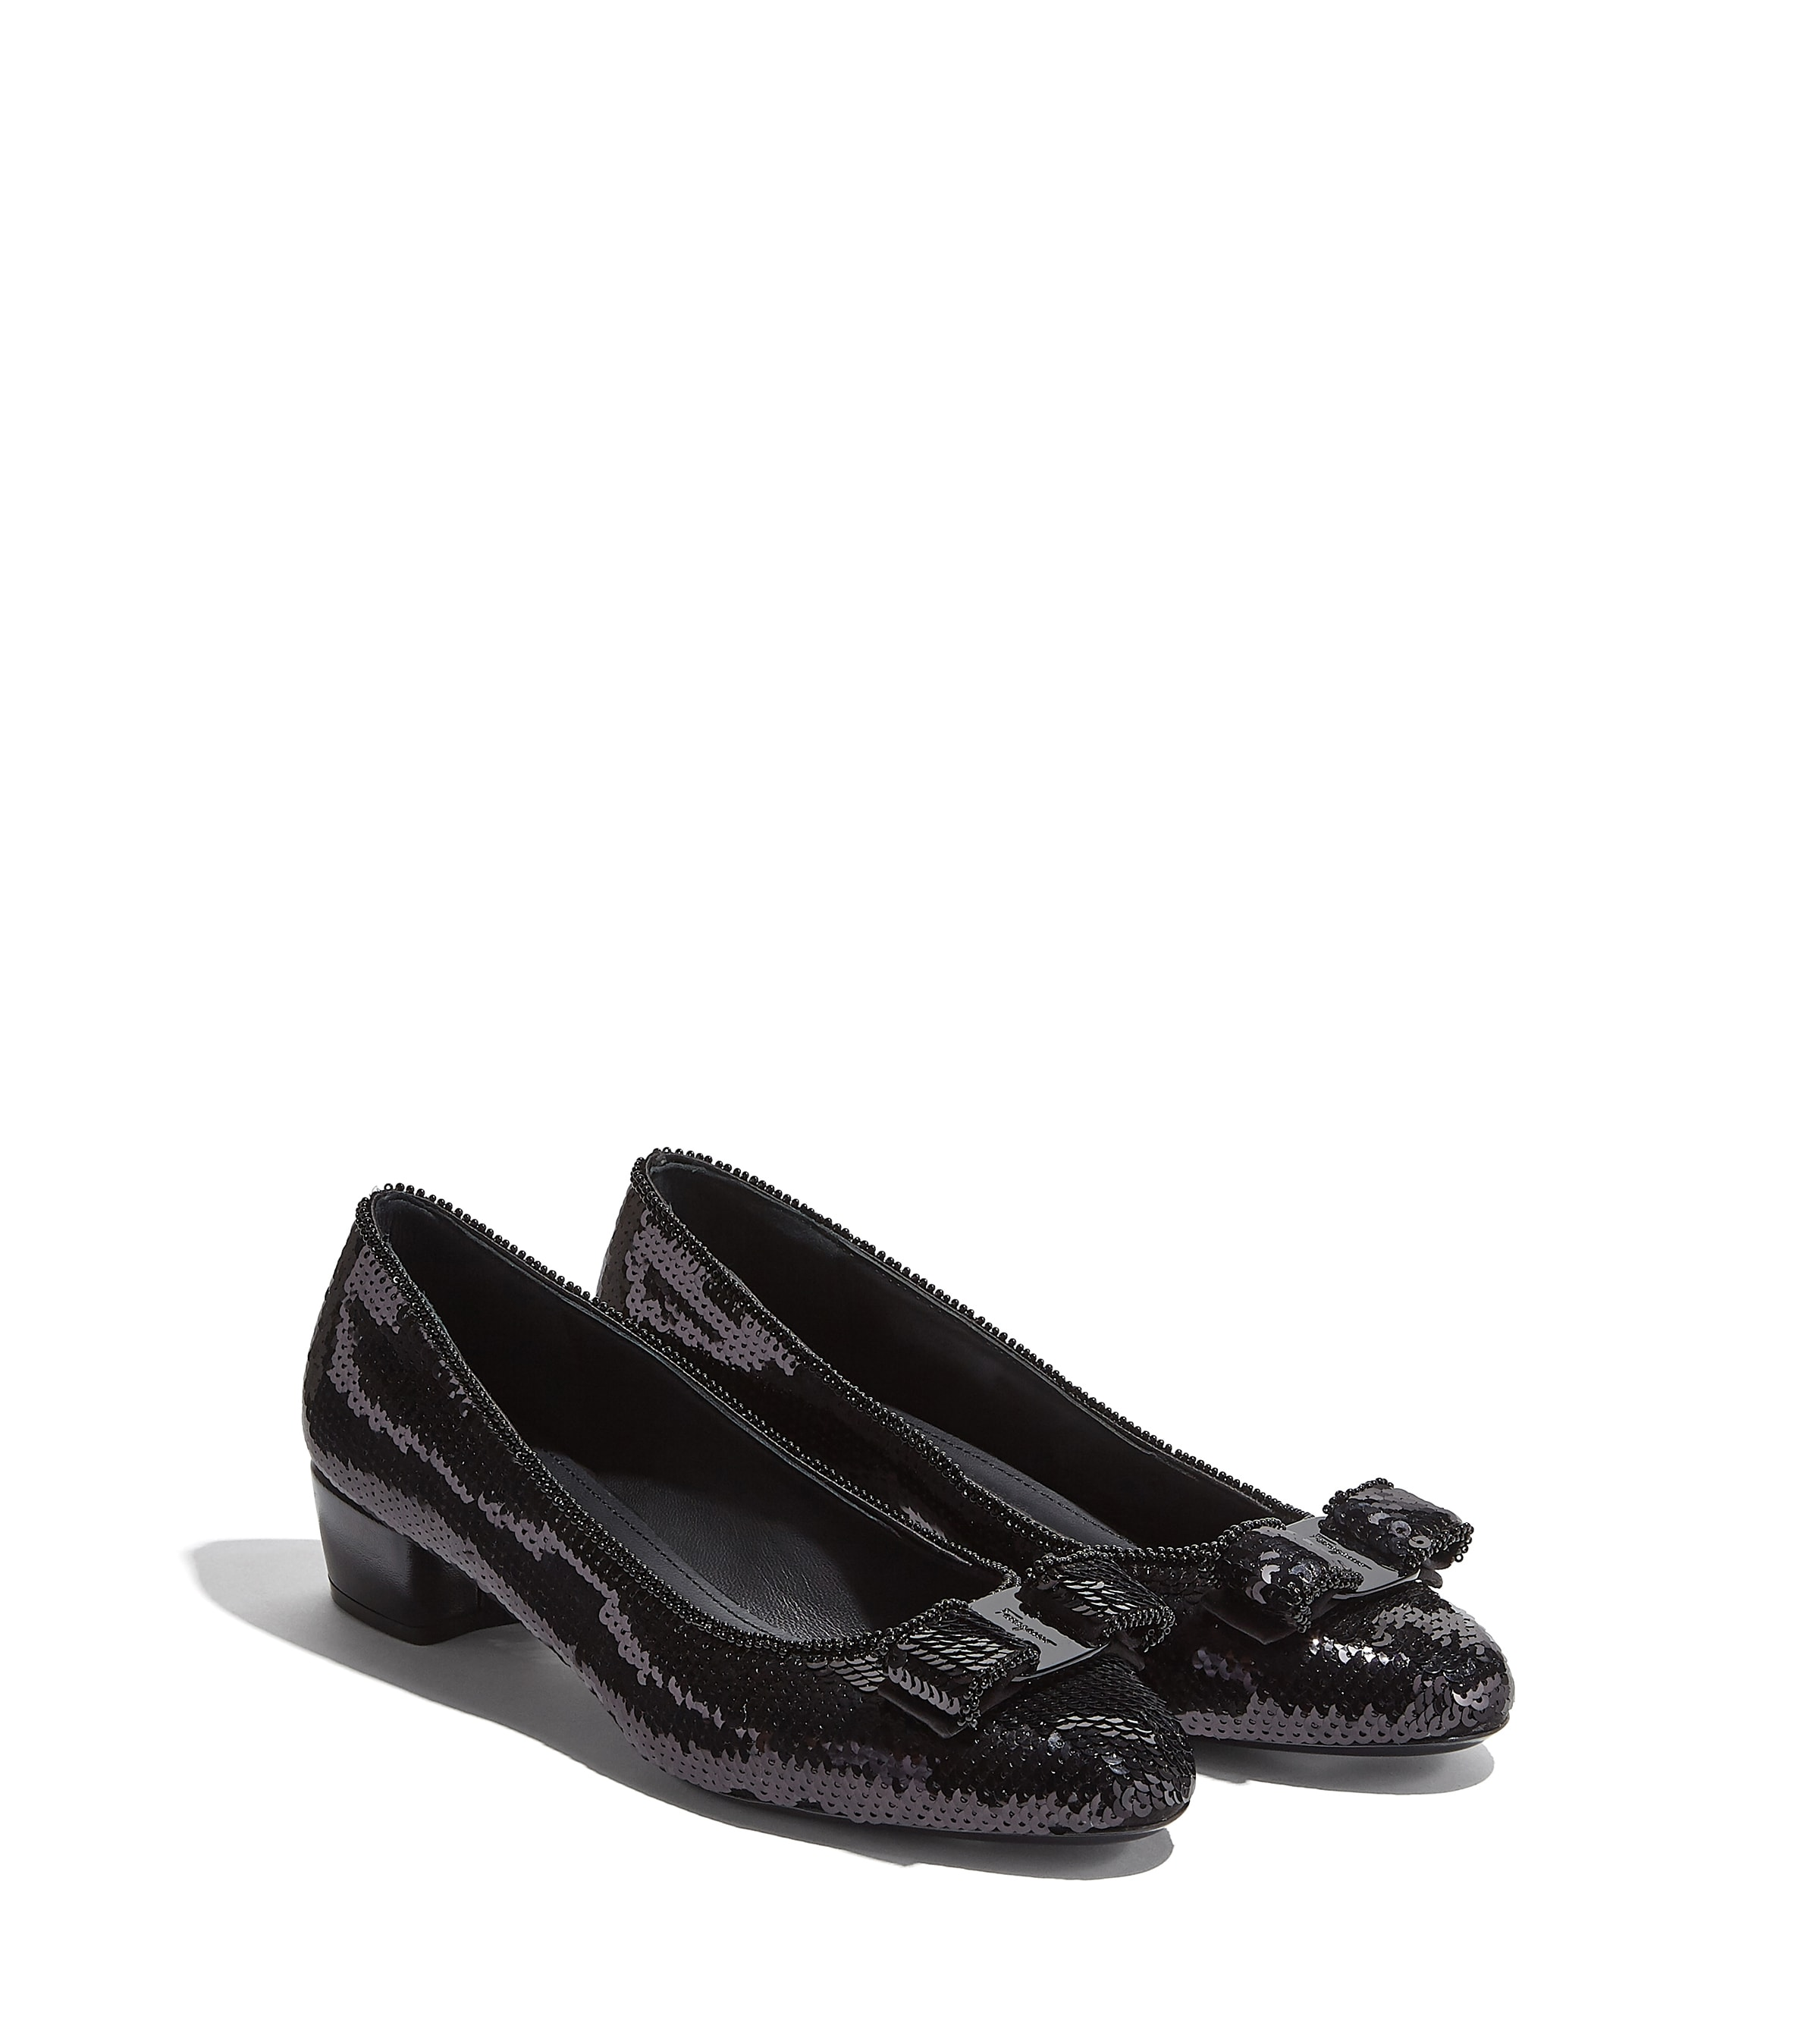 Vara bow pump - Shoes - Women - Salvatore Ferragamo EU